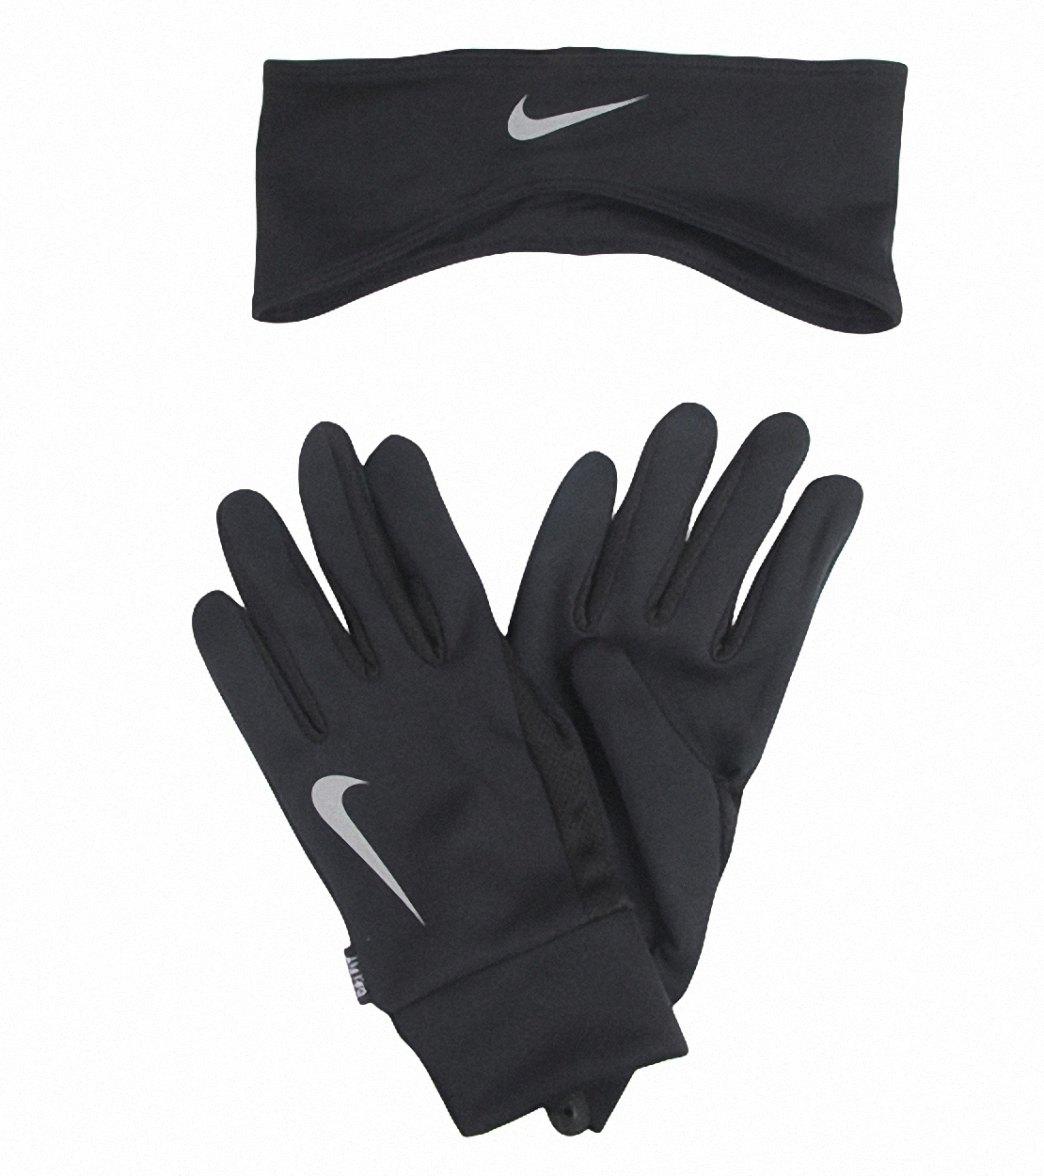 Nike Men s Running Dri-Fit Headband Glove Set at SwimOutlet.com 7641fd2a4f3